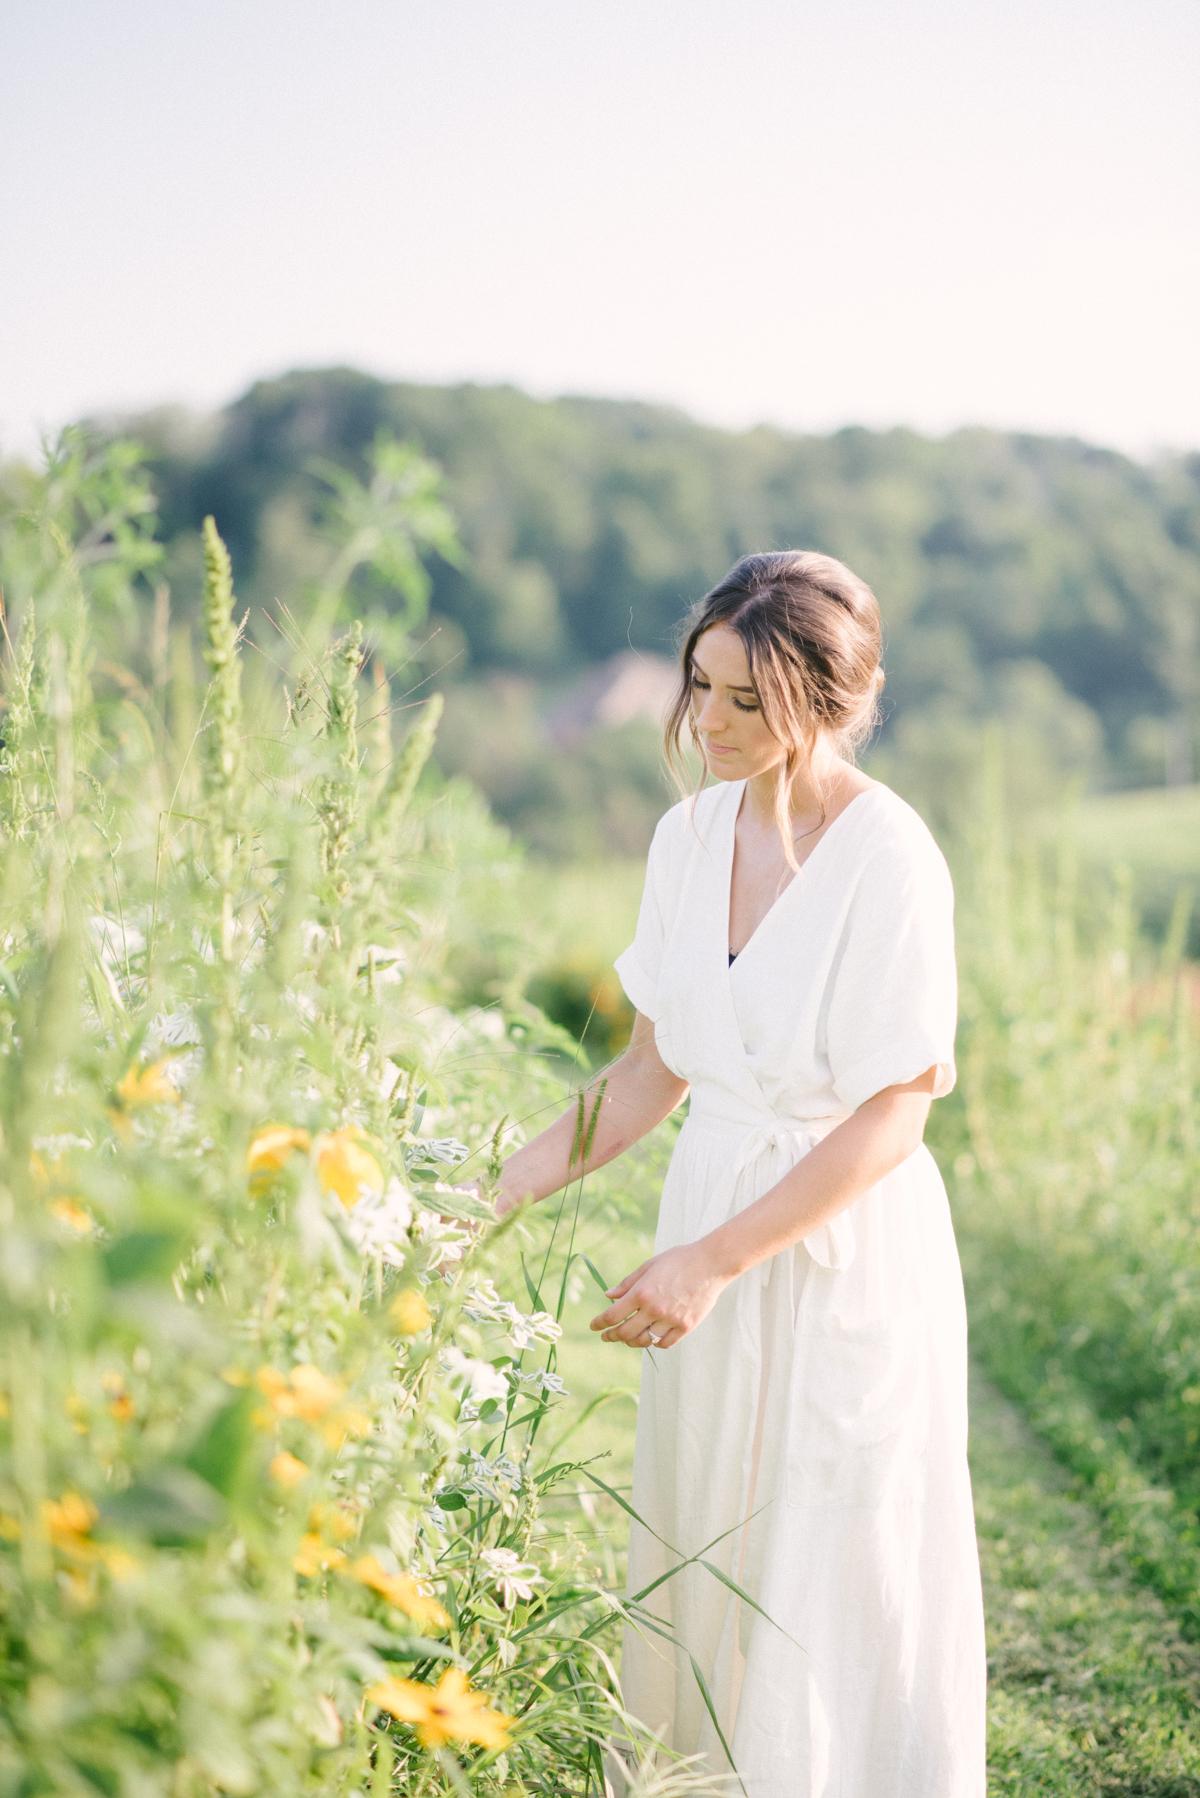 Eva Lin Photography 8.6.18-16.jpg